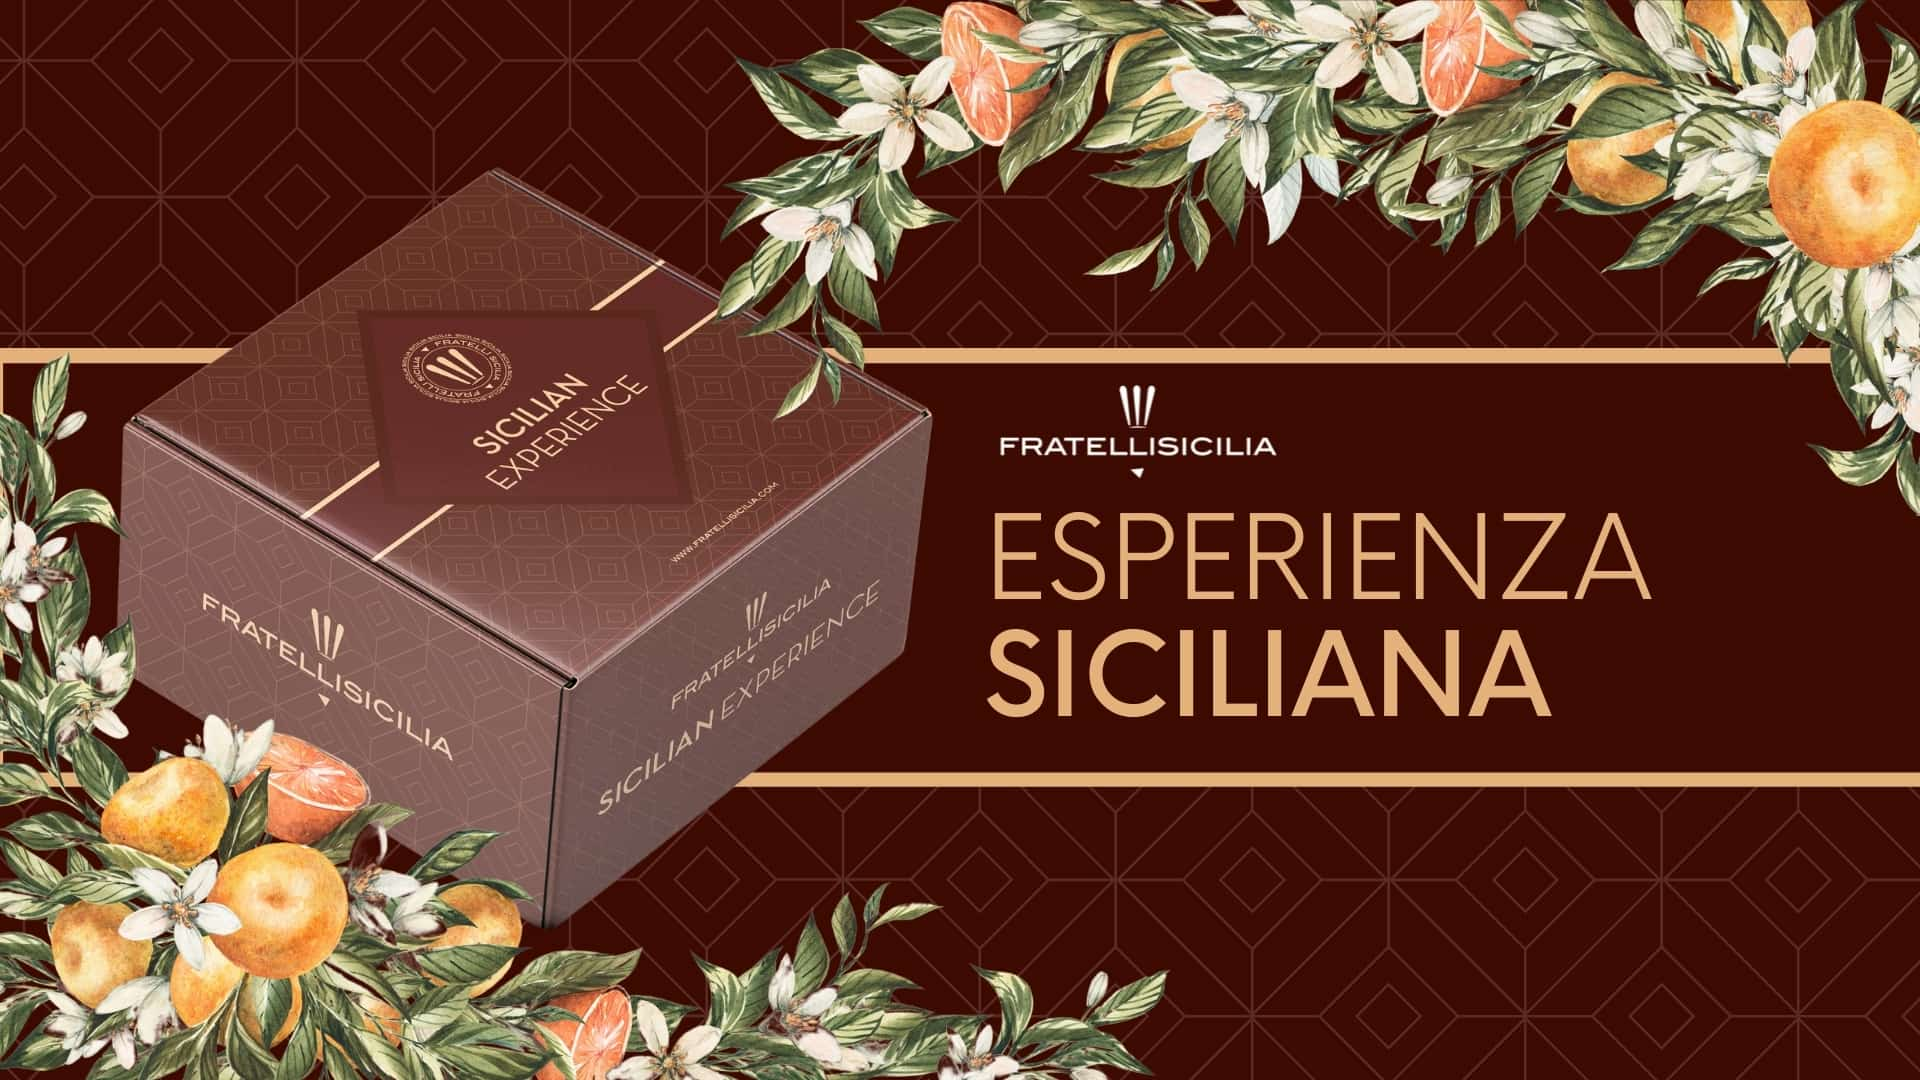 sicilian-experience-fratelli-sicilia